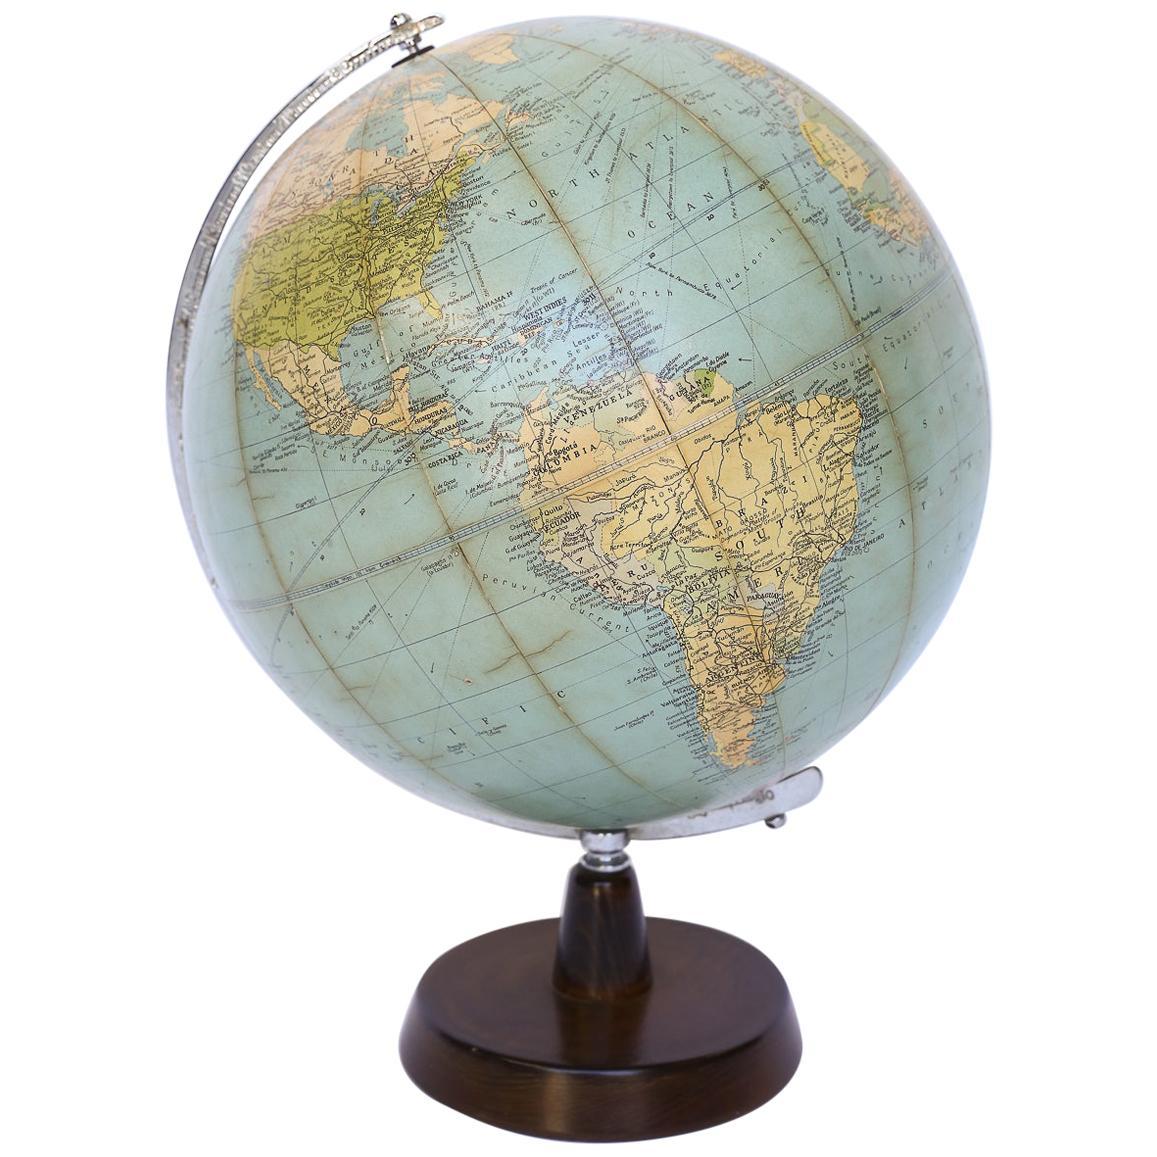 Philips' Challenge Globe, Copyright, 1960